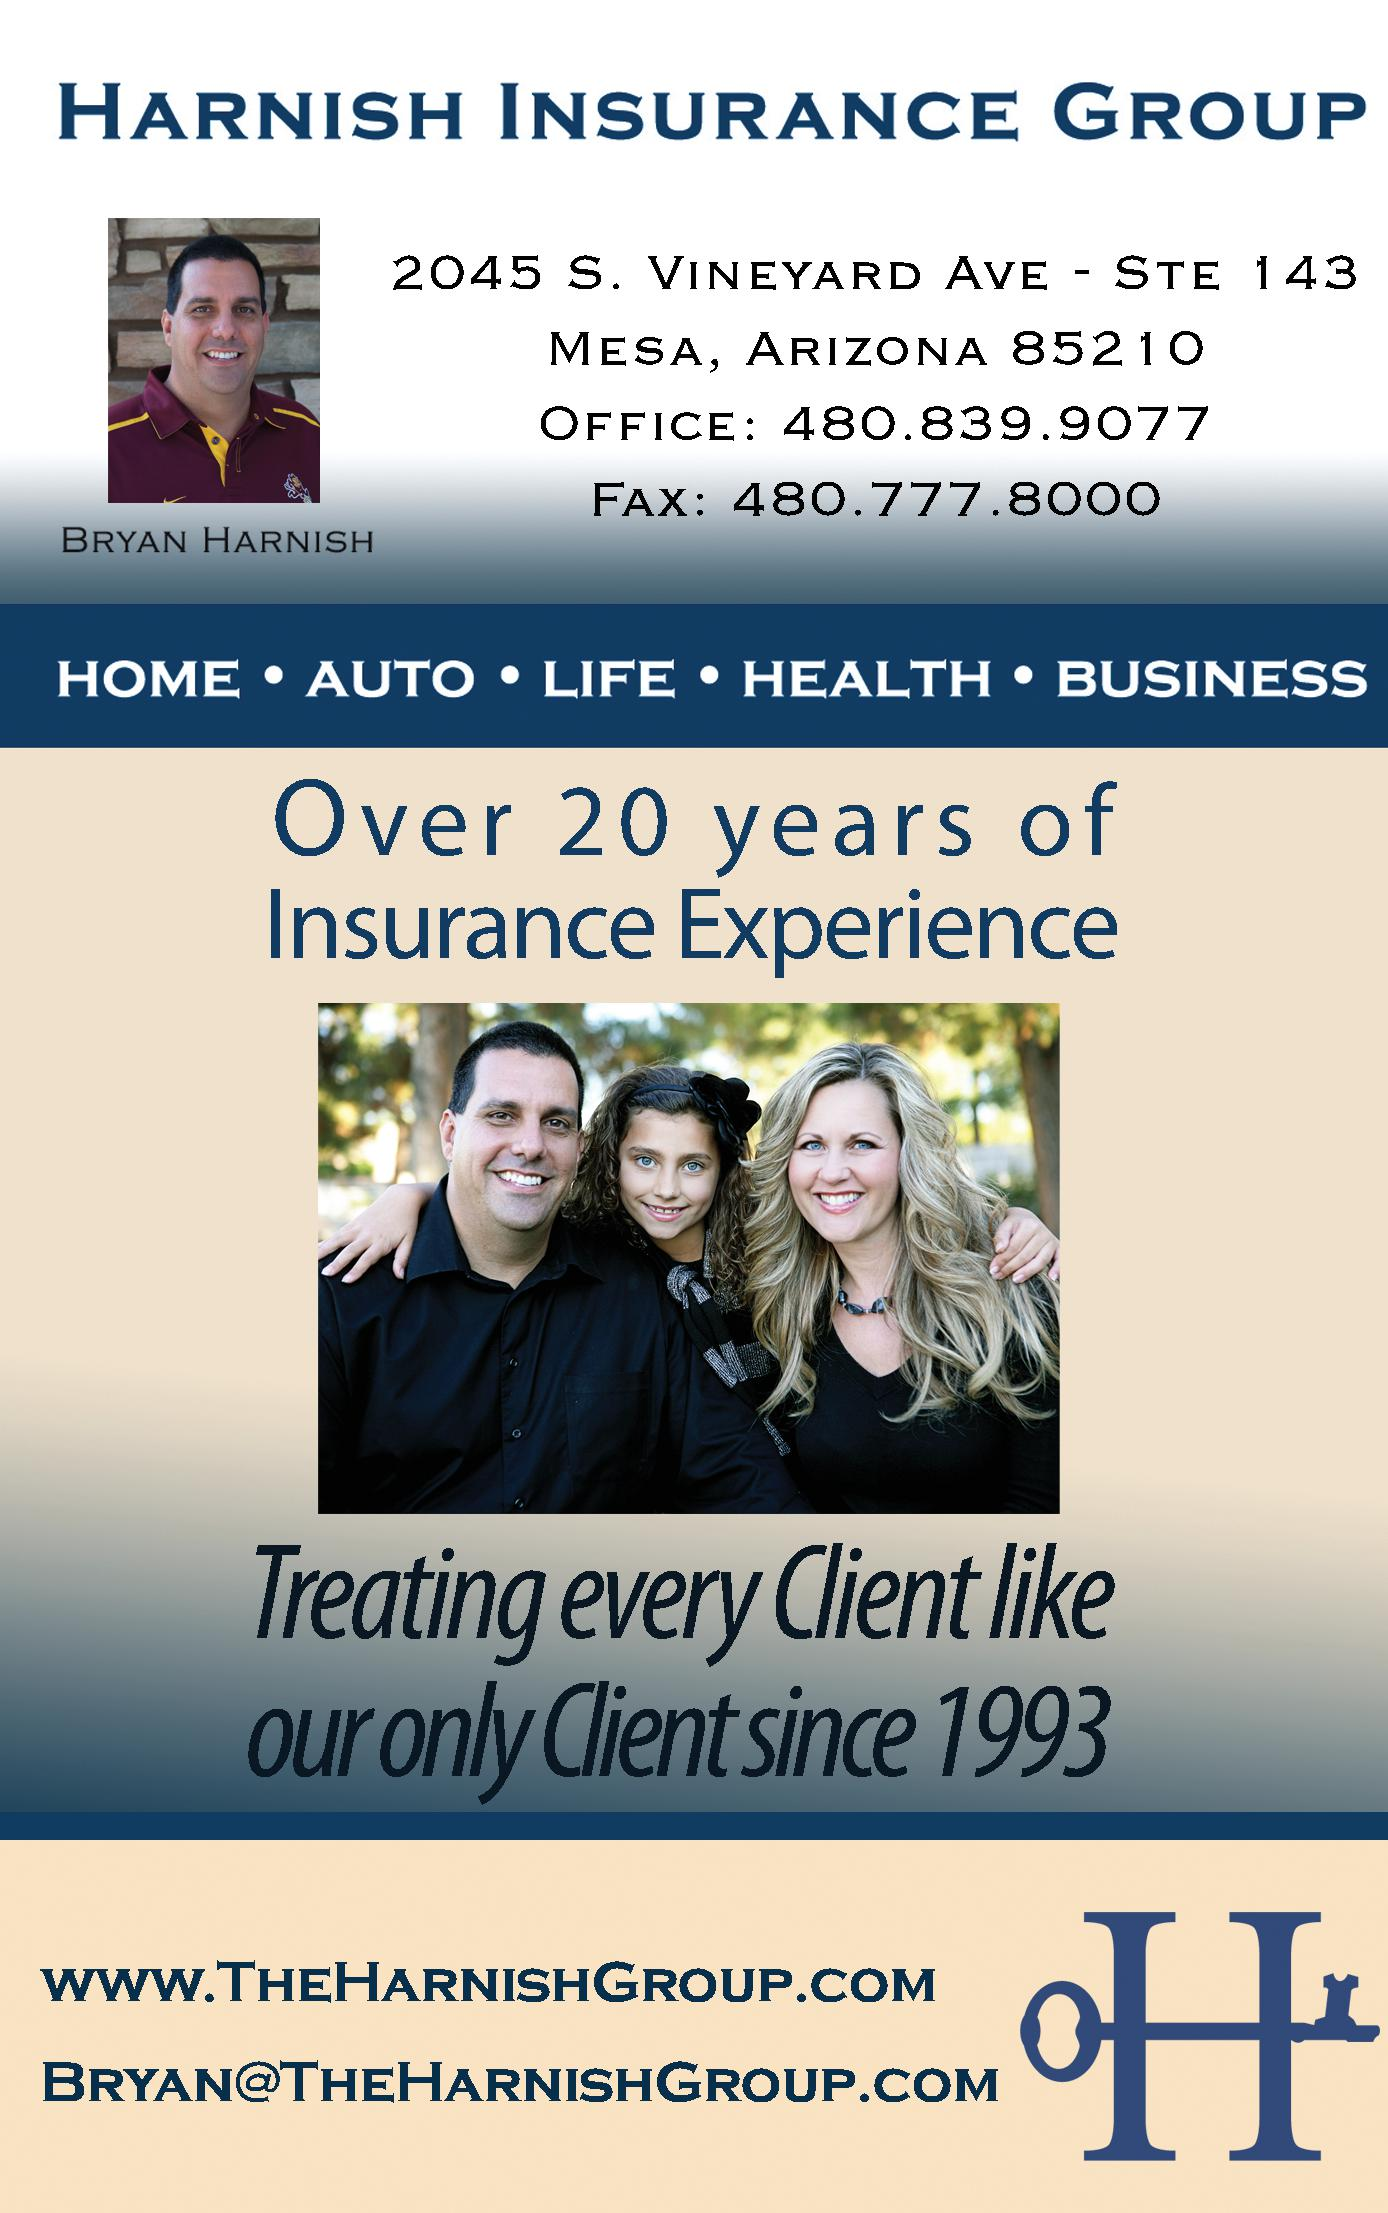 Harnish Insurance Group